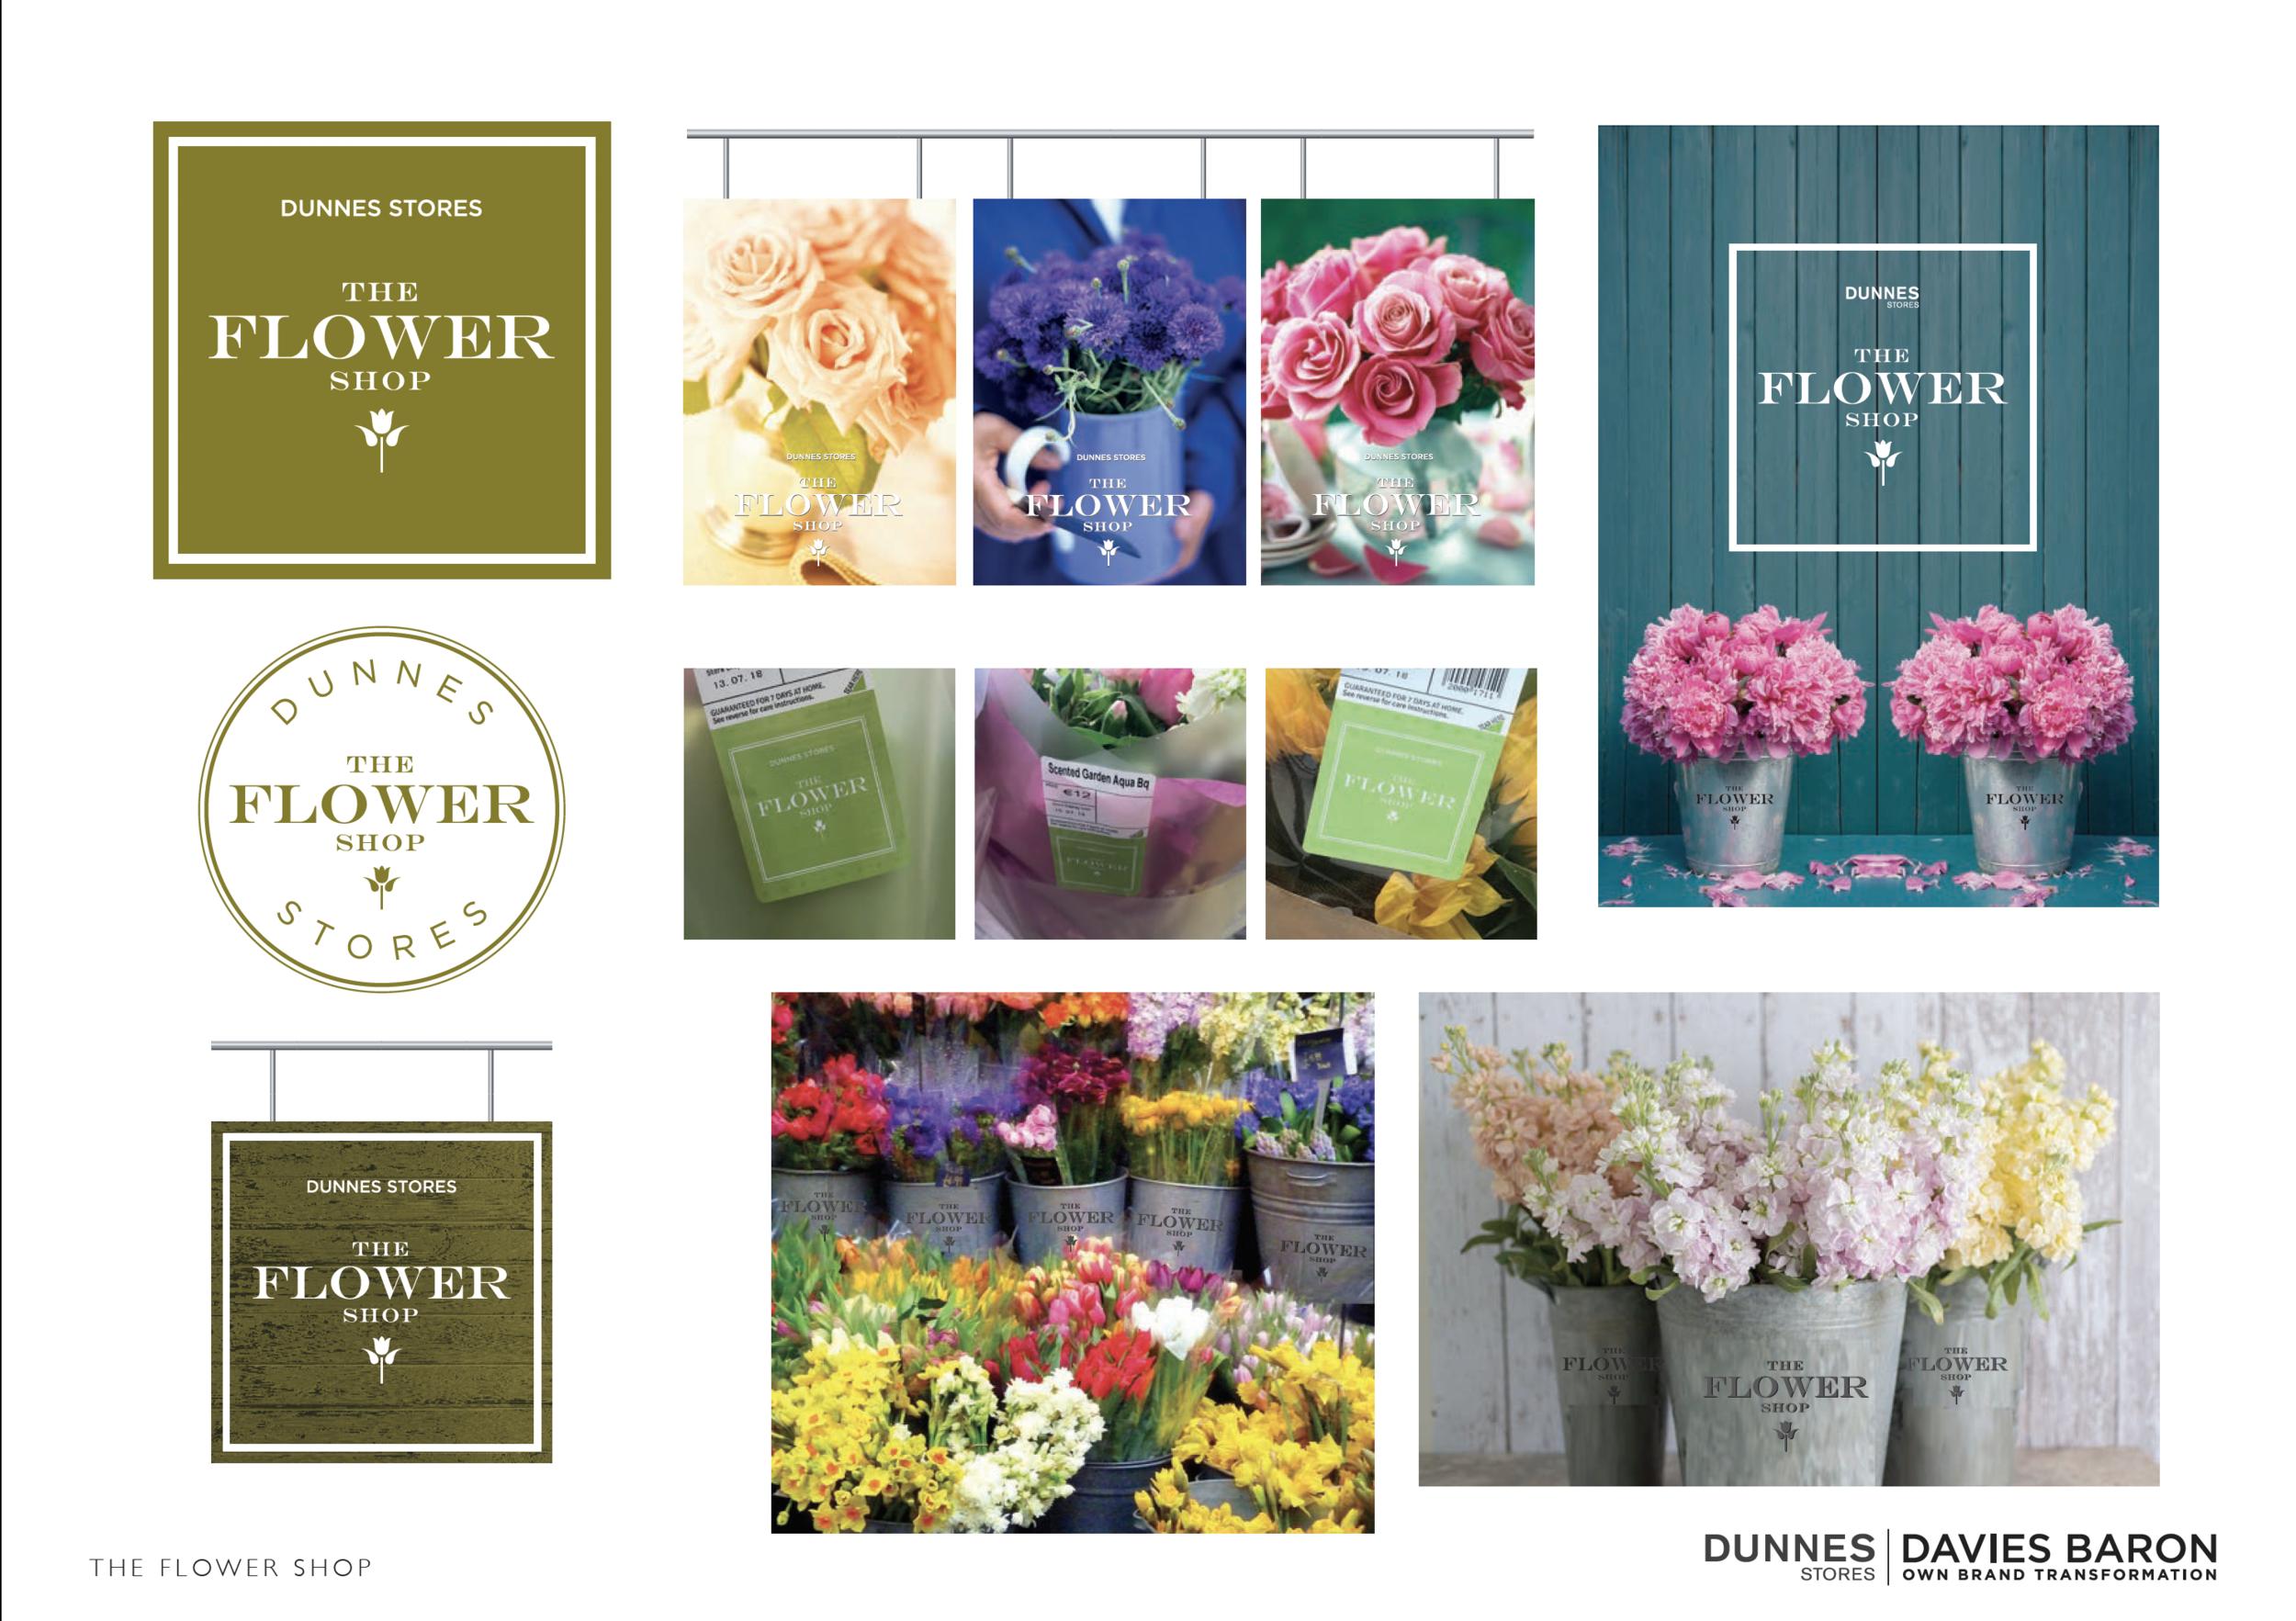 4 Dunnes Stores Flower Shop branding.png